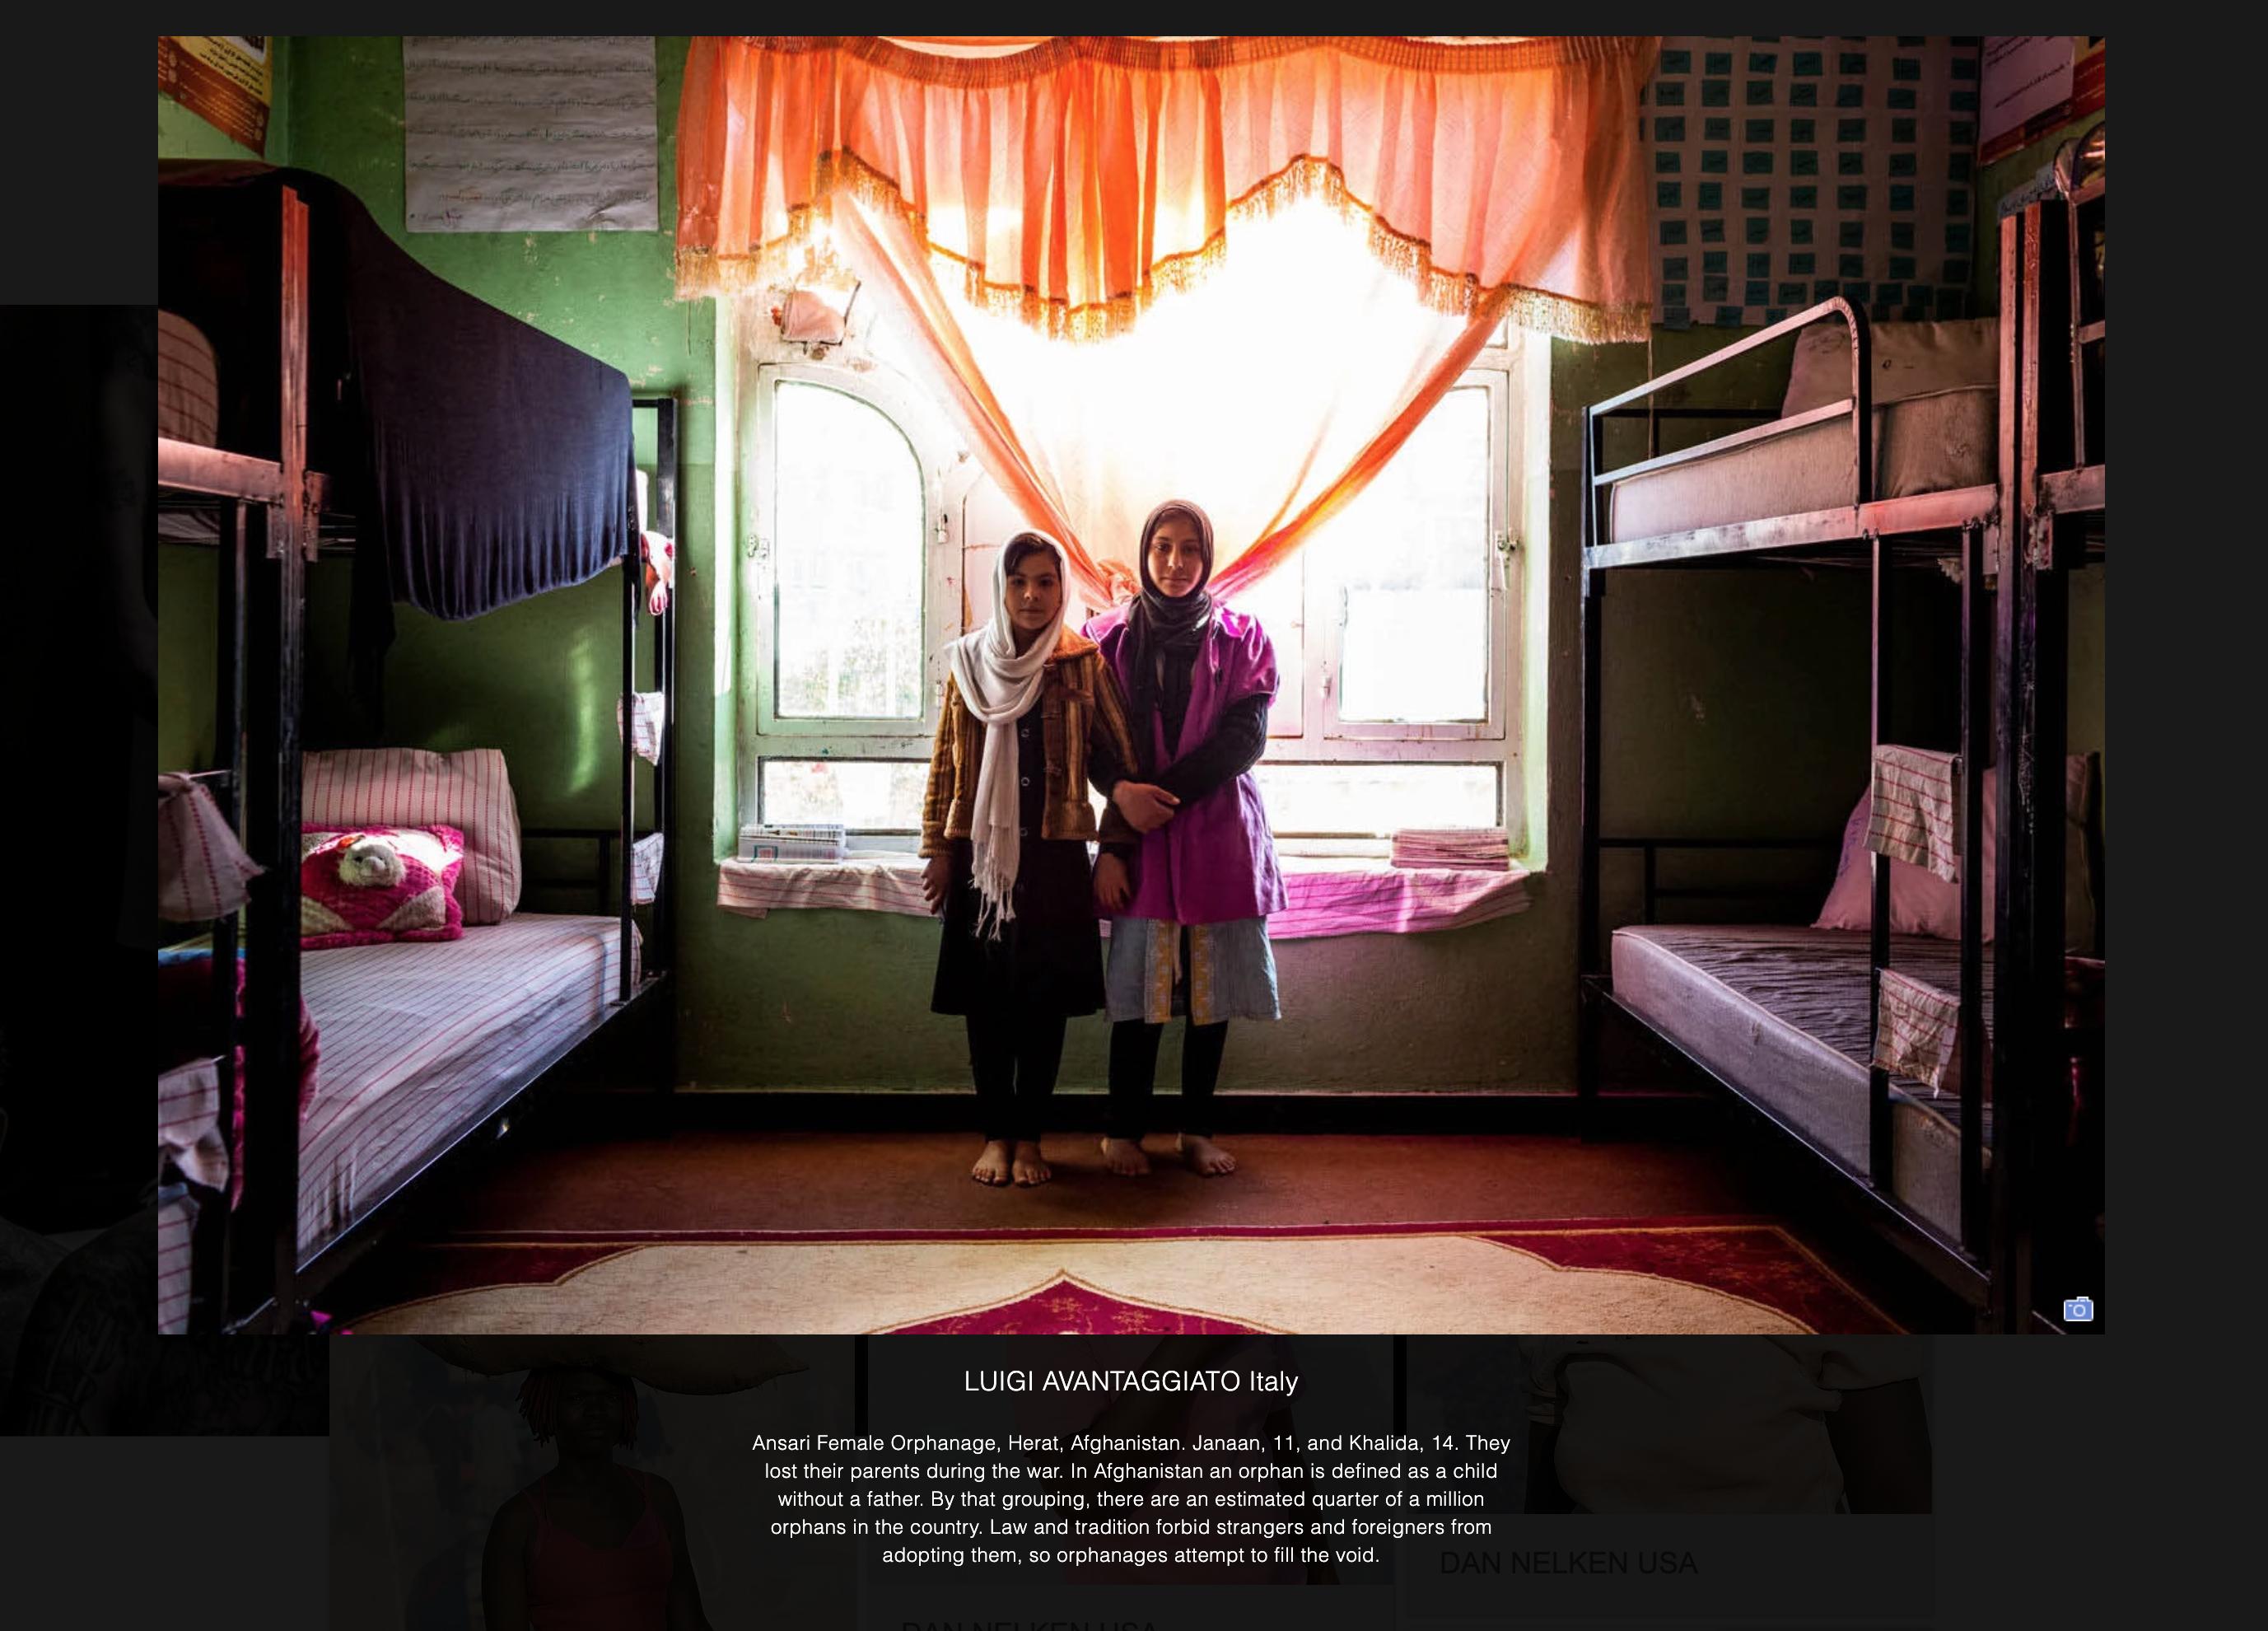 kuala lumpur photography awards 2019